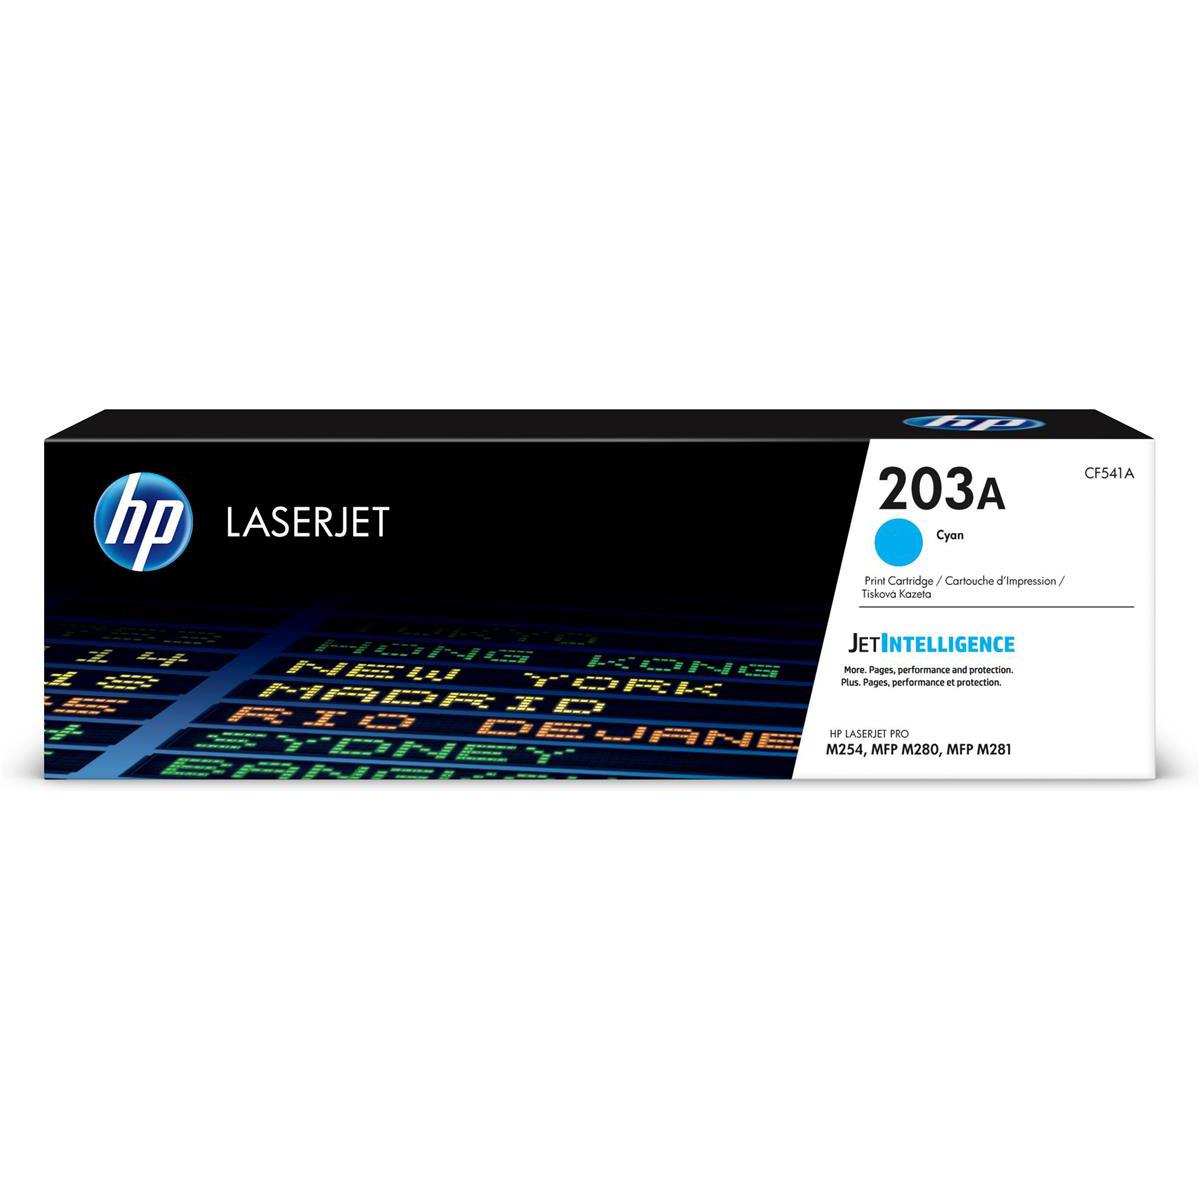 HP 203A LaserJet Toner Cartridge Page Life 1300pp Cyan Ref CF541A